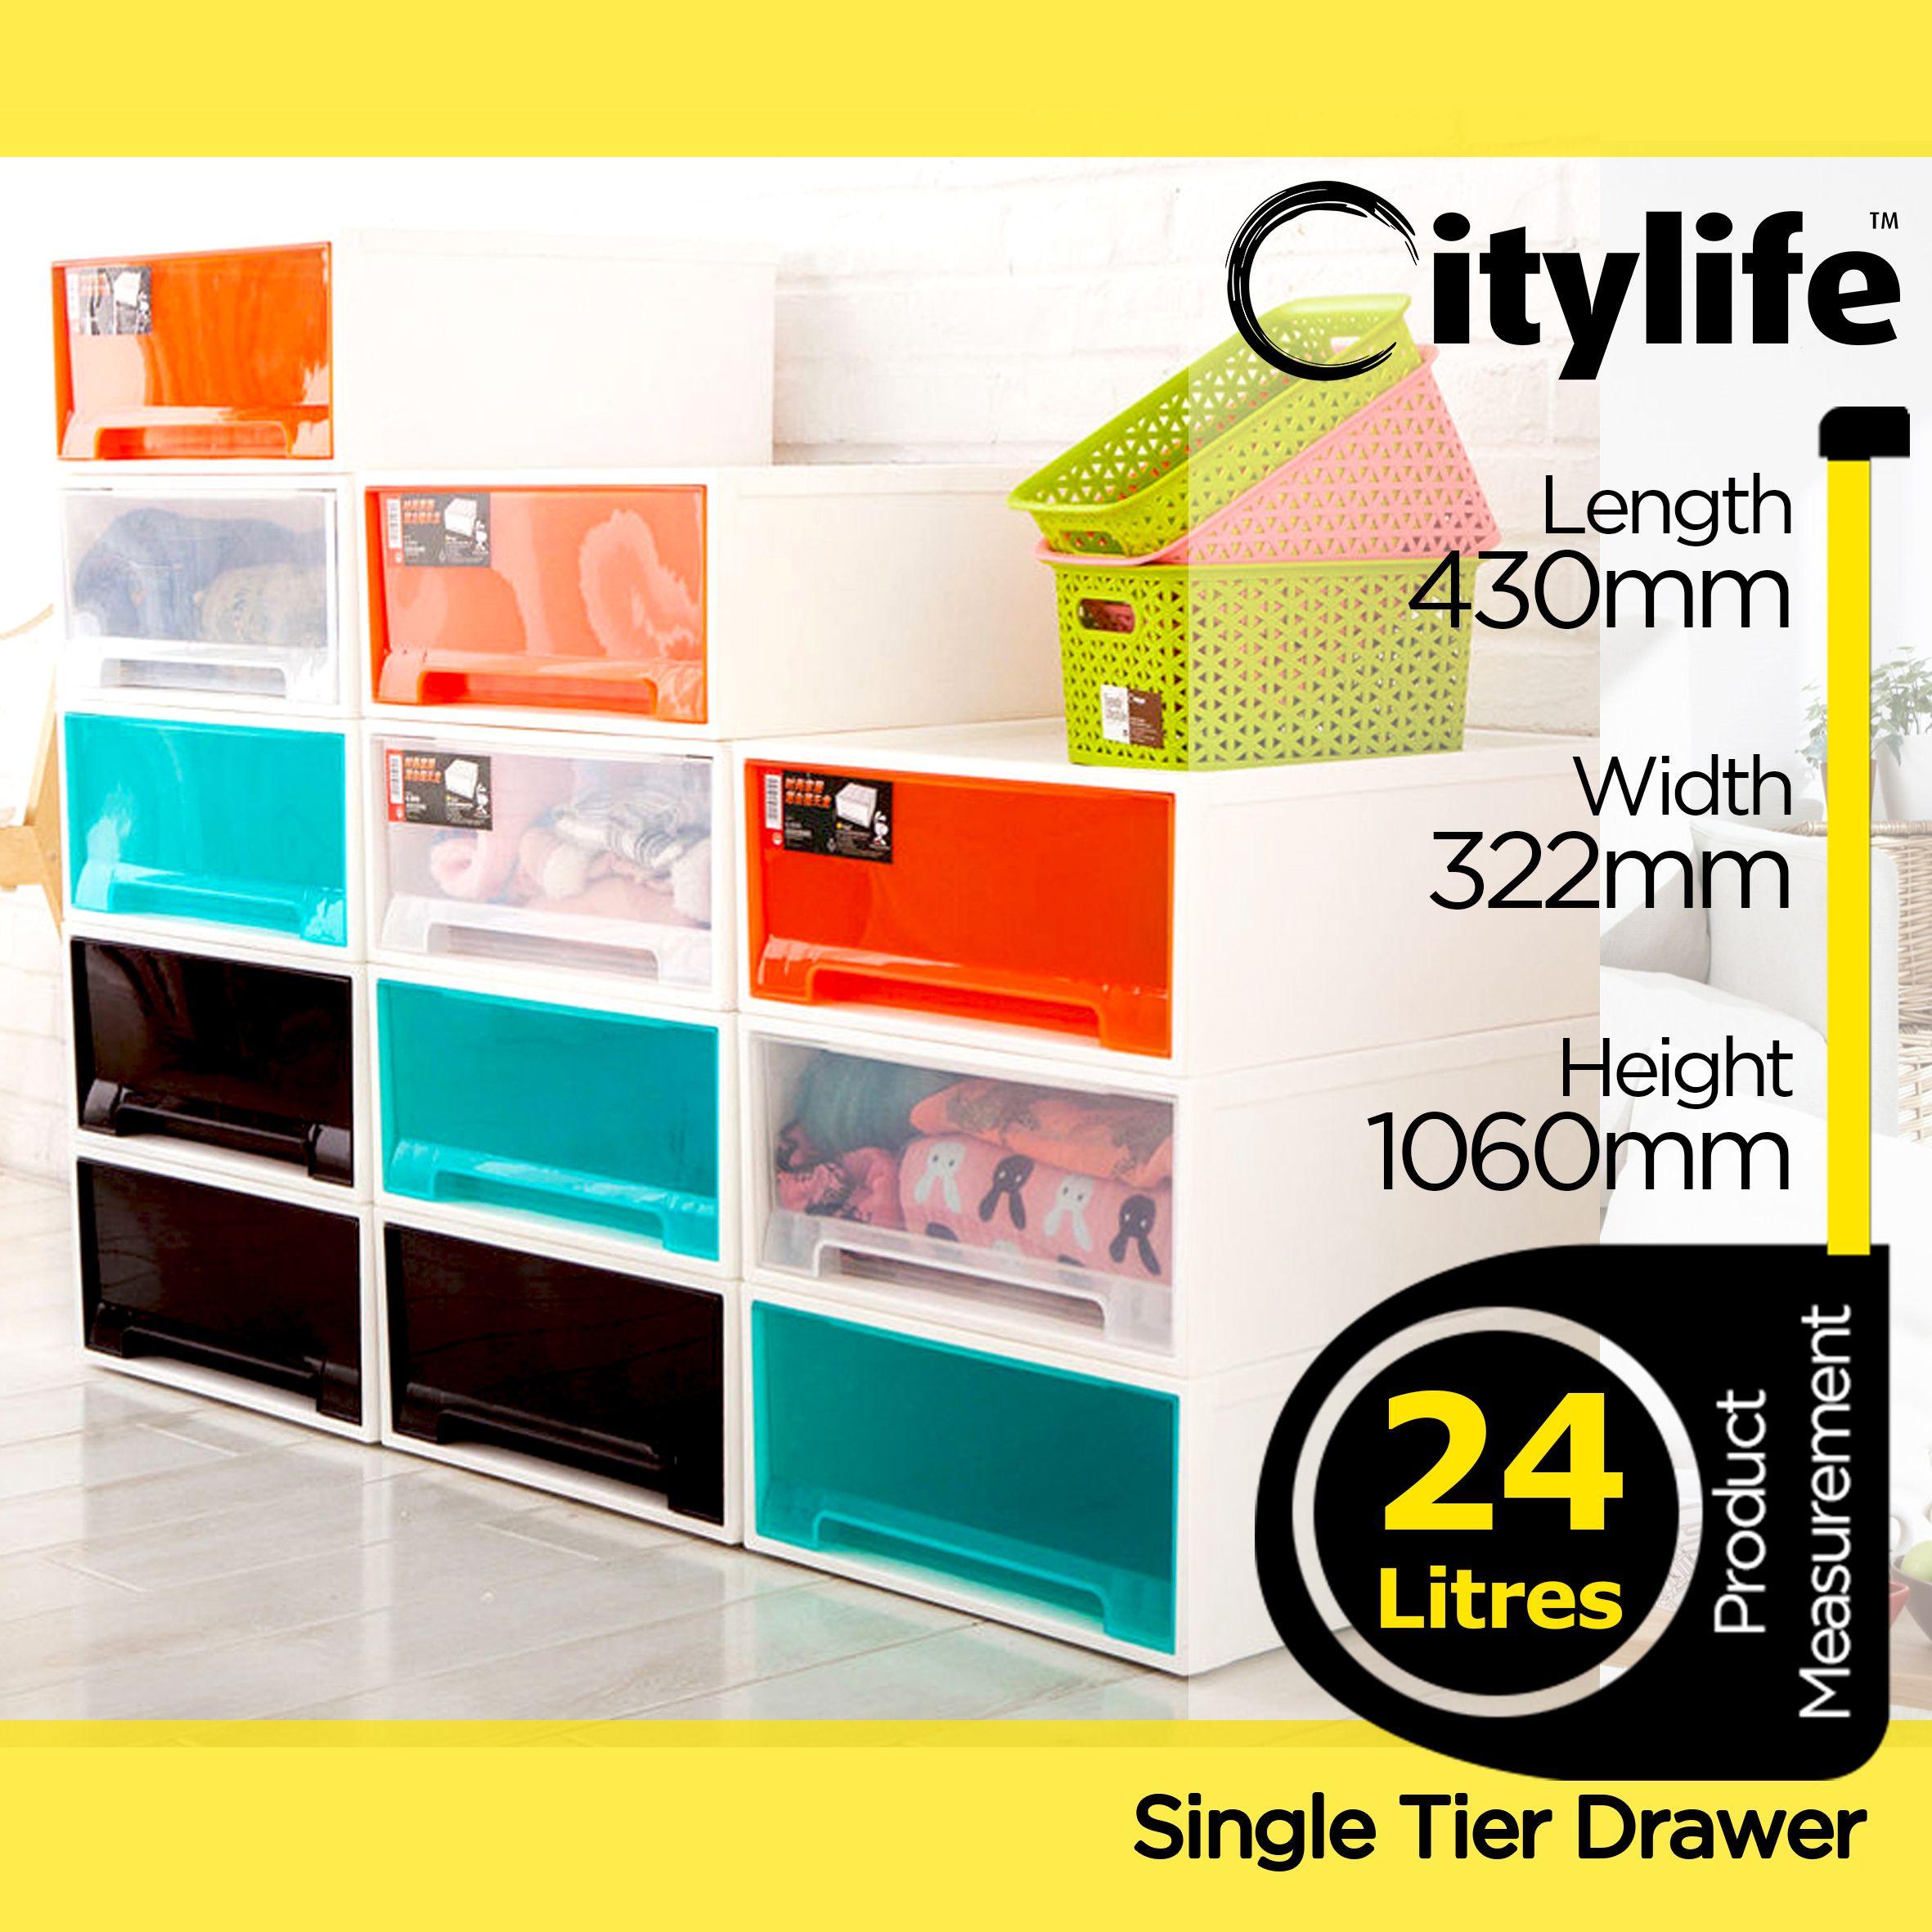 On Promotion Now Online Exclusive Citylife 24L Signature Single